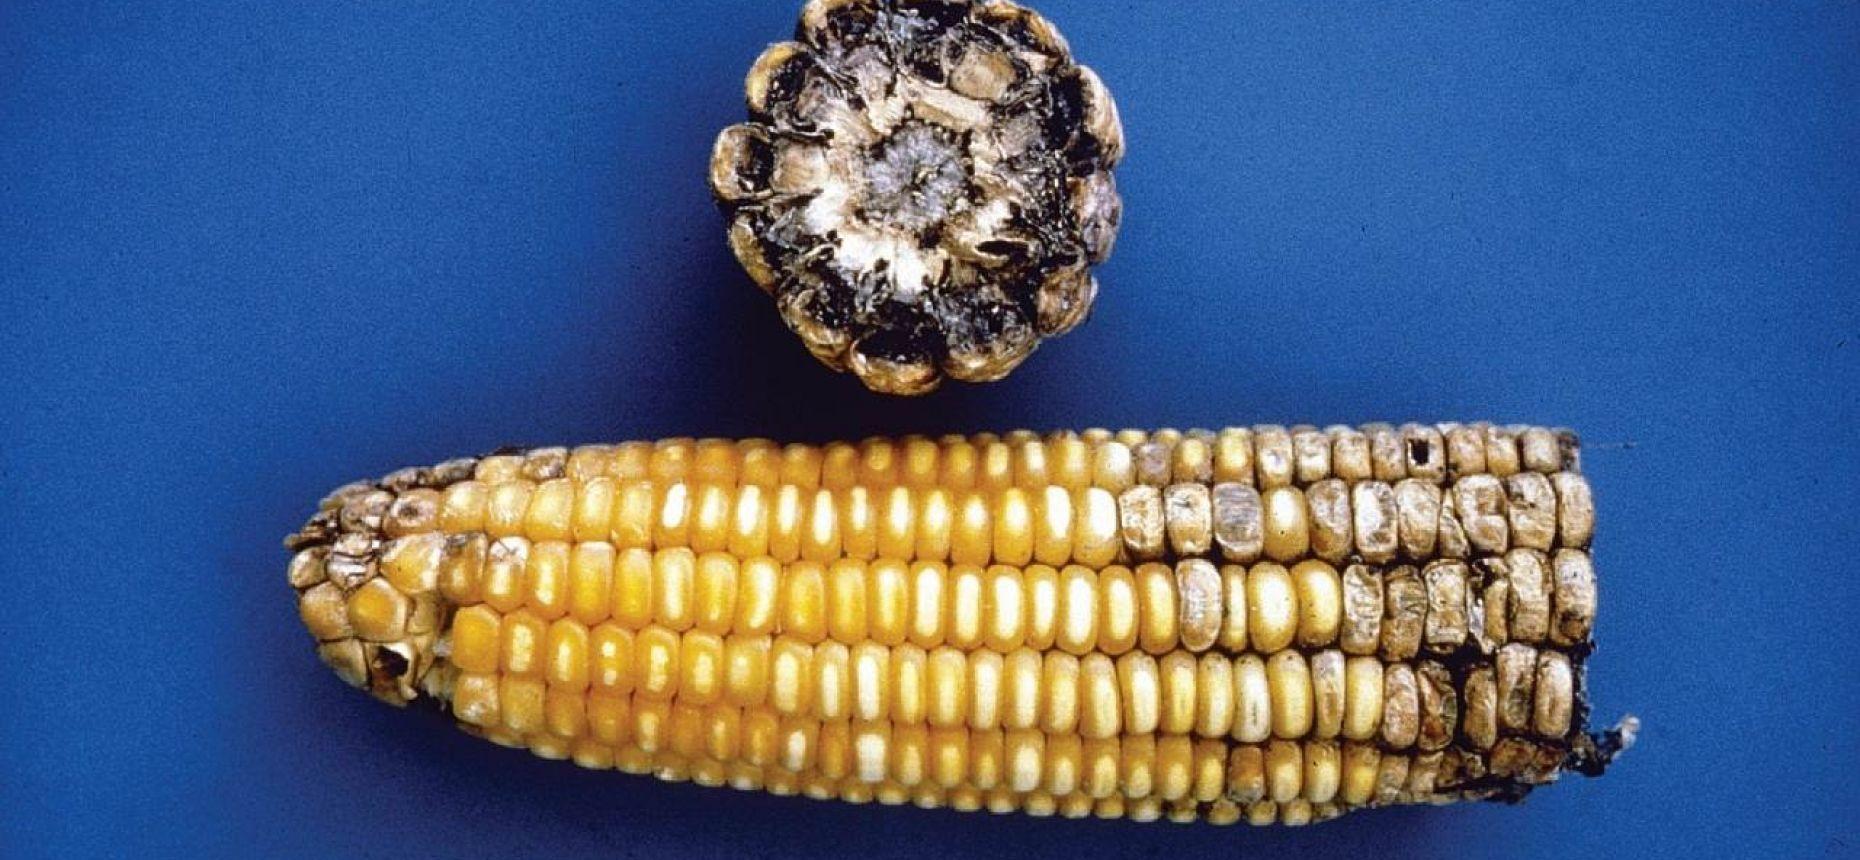 Нигроспороз кукурузы - Nigrospora oryzae (Berk. & Broome) Petch.